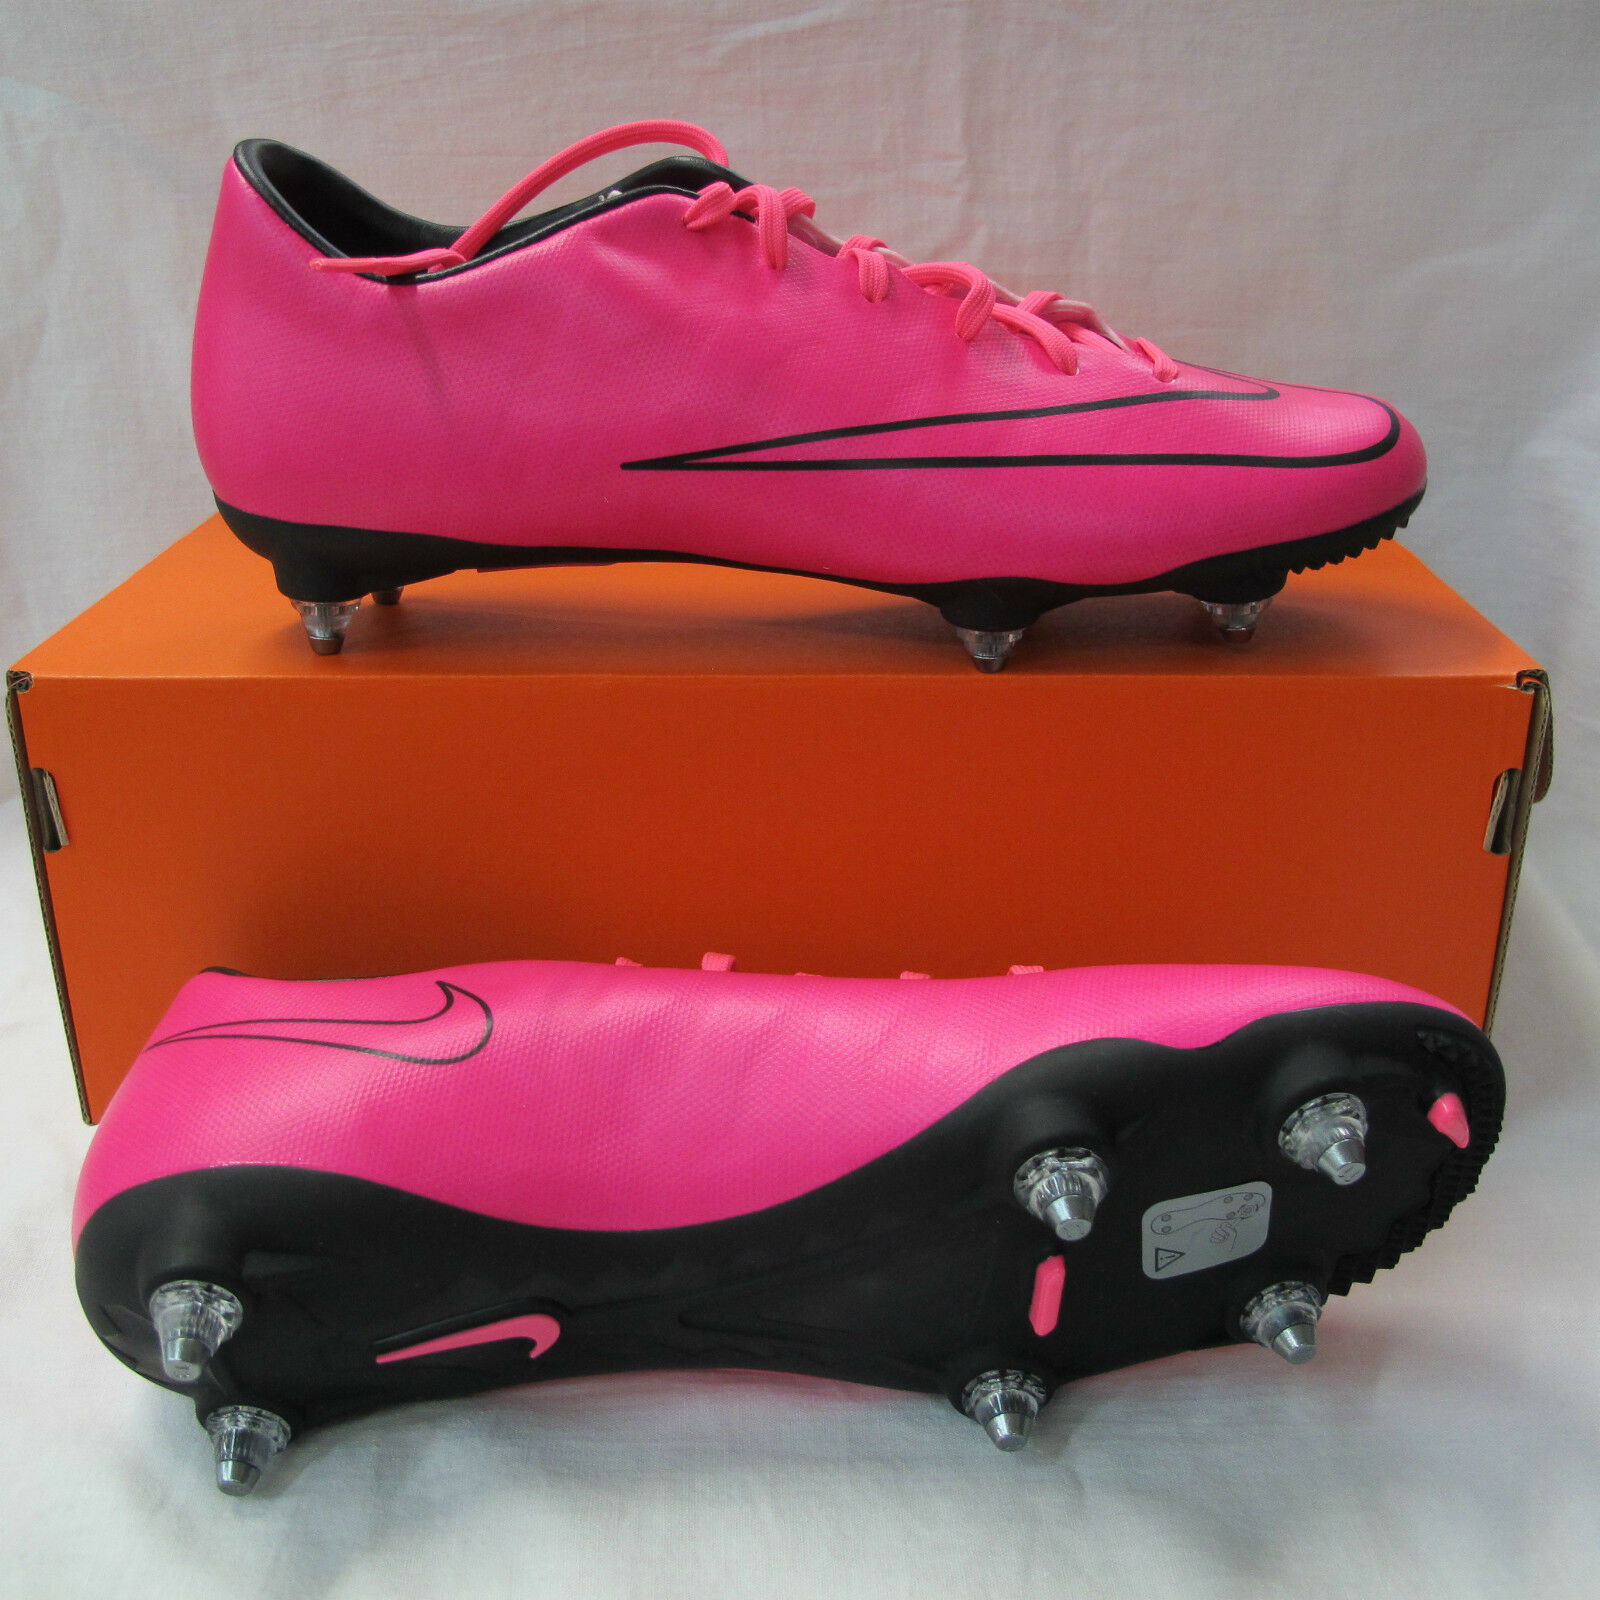 NIKE botas fútbol fútbol fútbol MERCURIAL VICTORY V SG 651633 660 col. FUXIA FLUO agosto 2015 6fee43